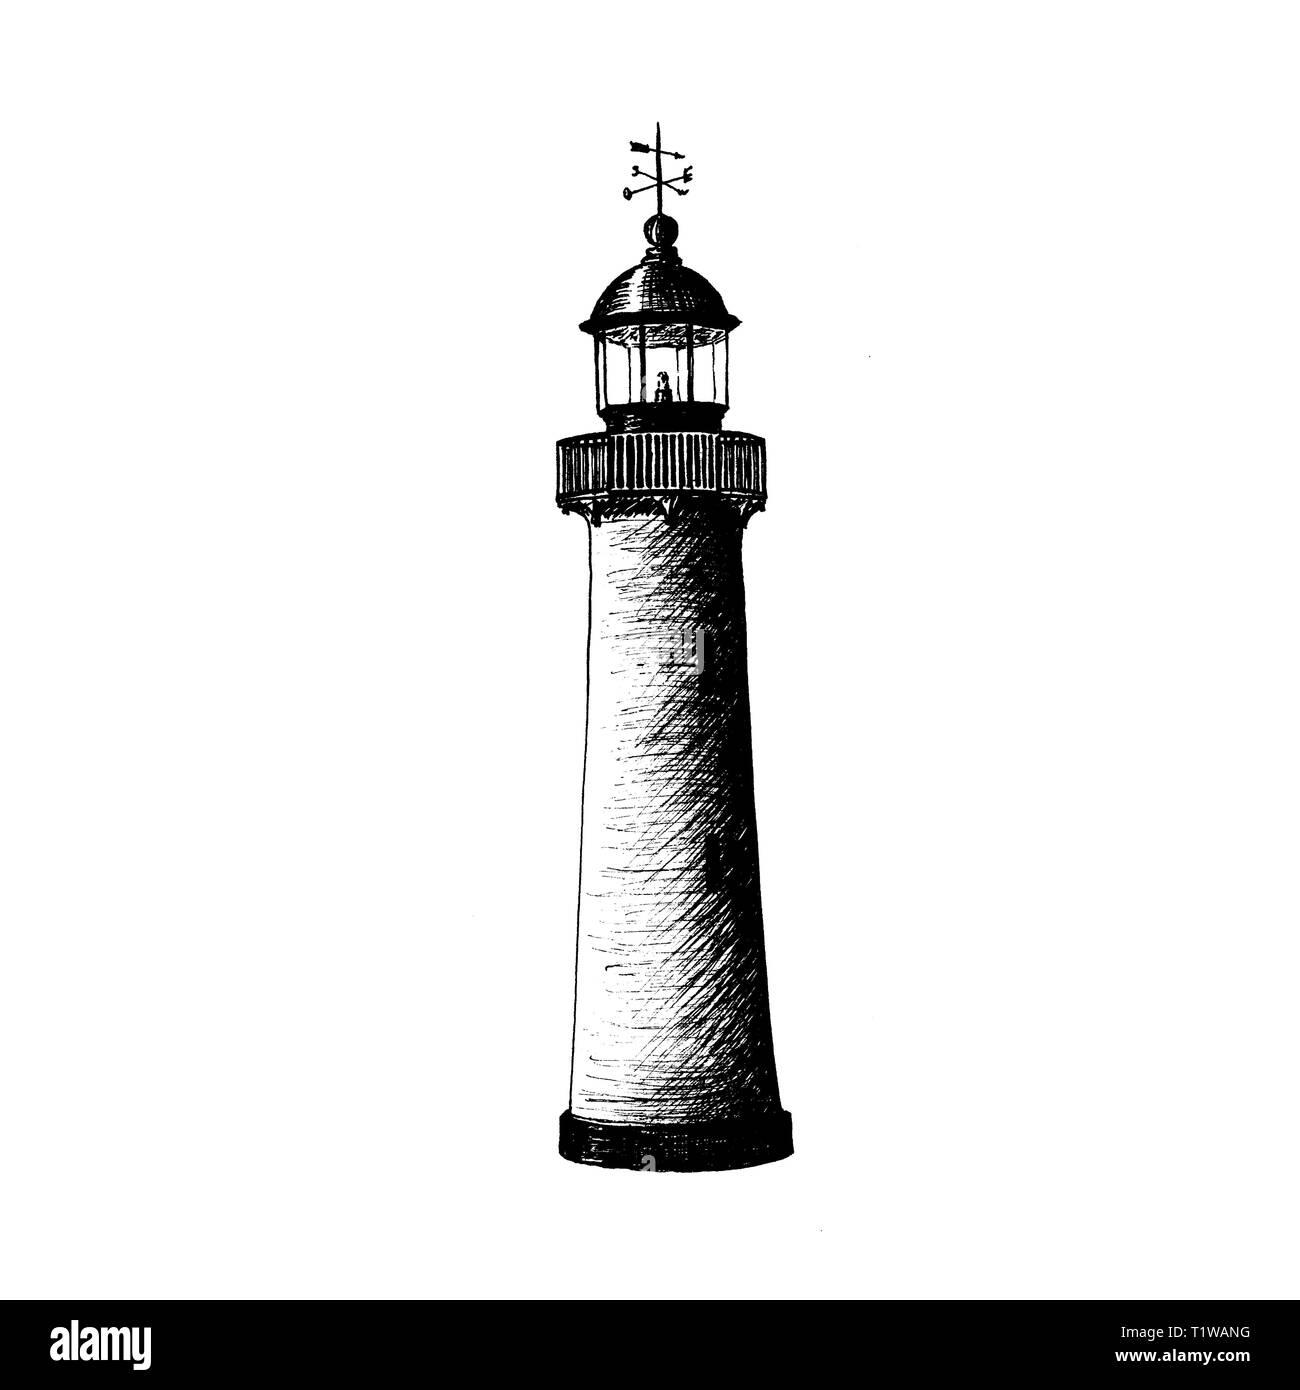 Lighthouse logo template design. illustration. beacon, sea-light, pike, light tower, guiding light, seamark. Ink pen sketch - Stock Image